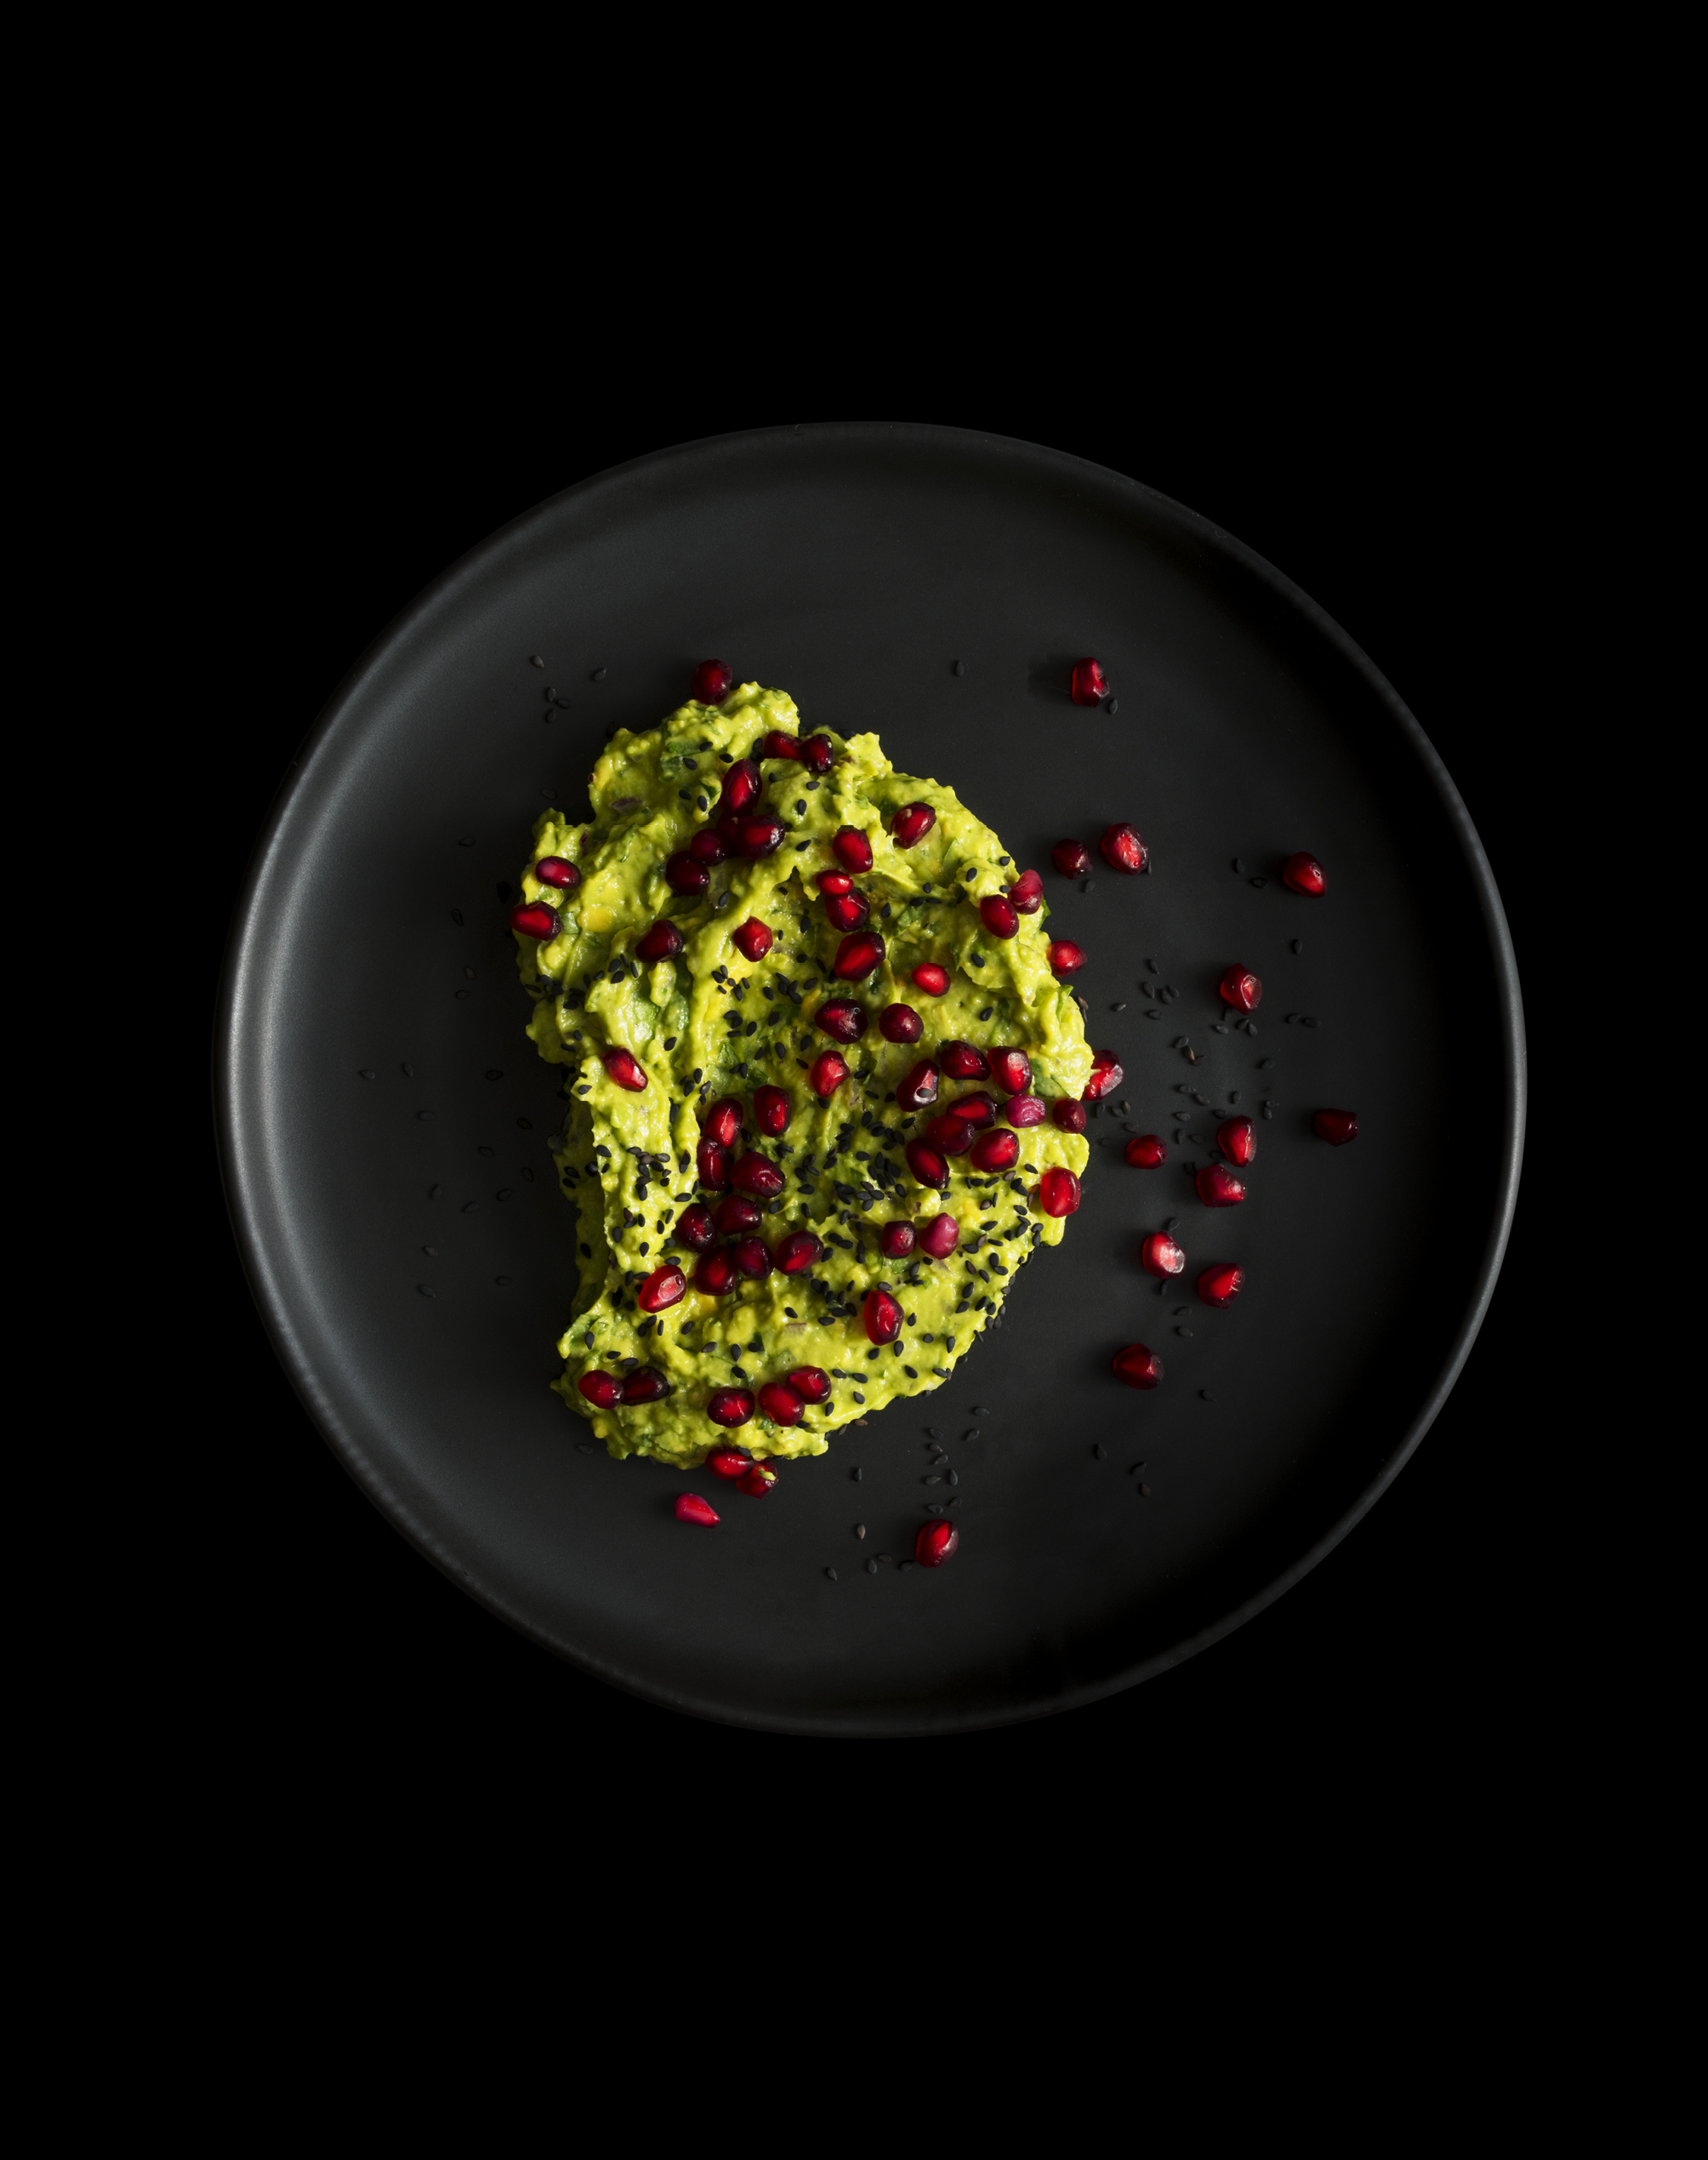 Guacamole from The Recipe by Josh Emett, image copyright © Kieran E. Scott.jpg